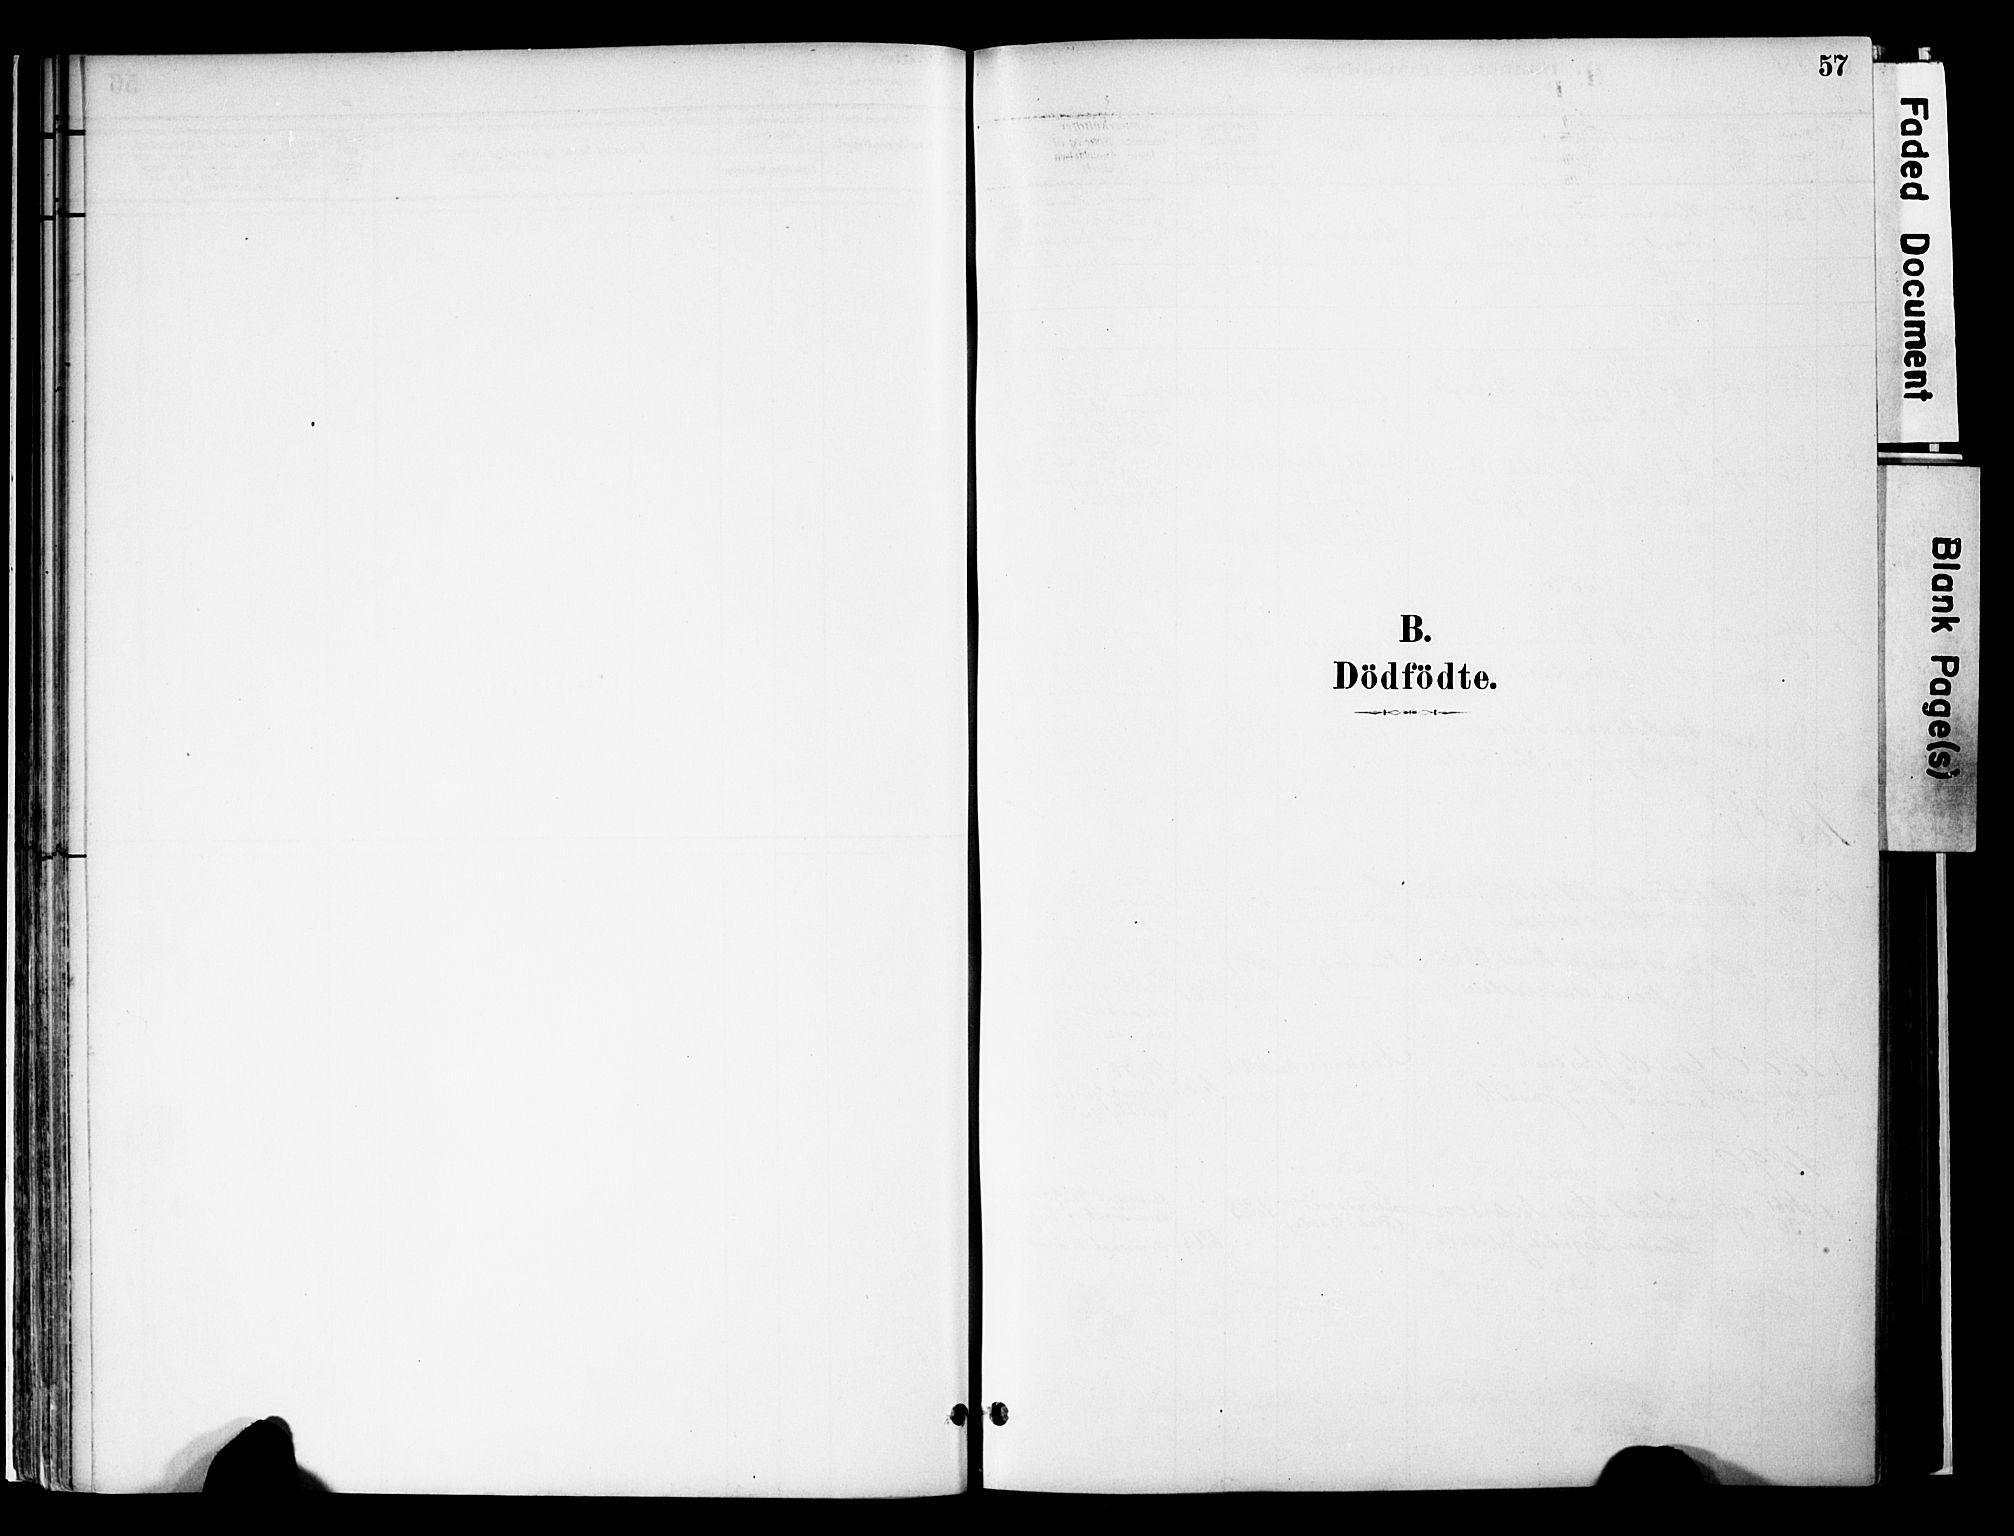 SAH, Vestre Slidre prestekontor, Ministerialbok nr. 6, 1881-1912, s. 57